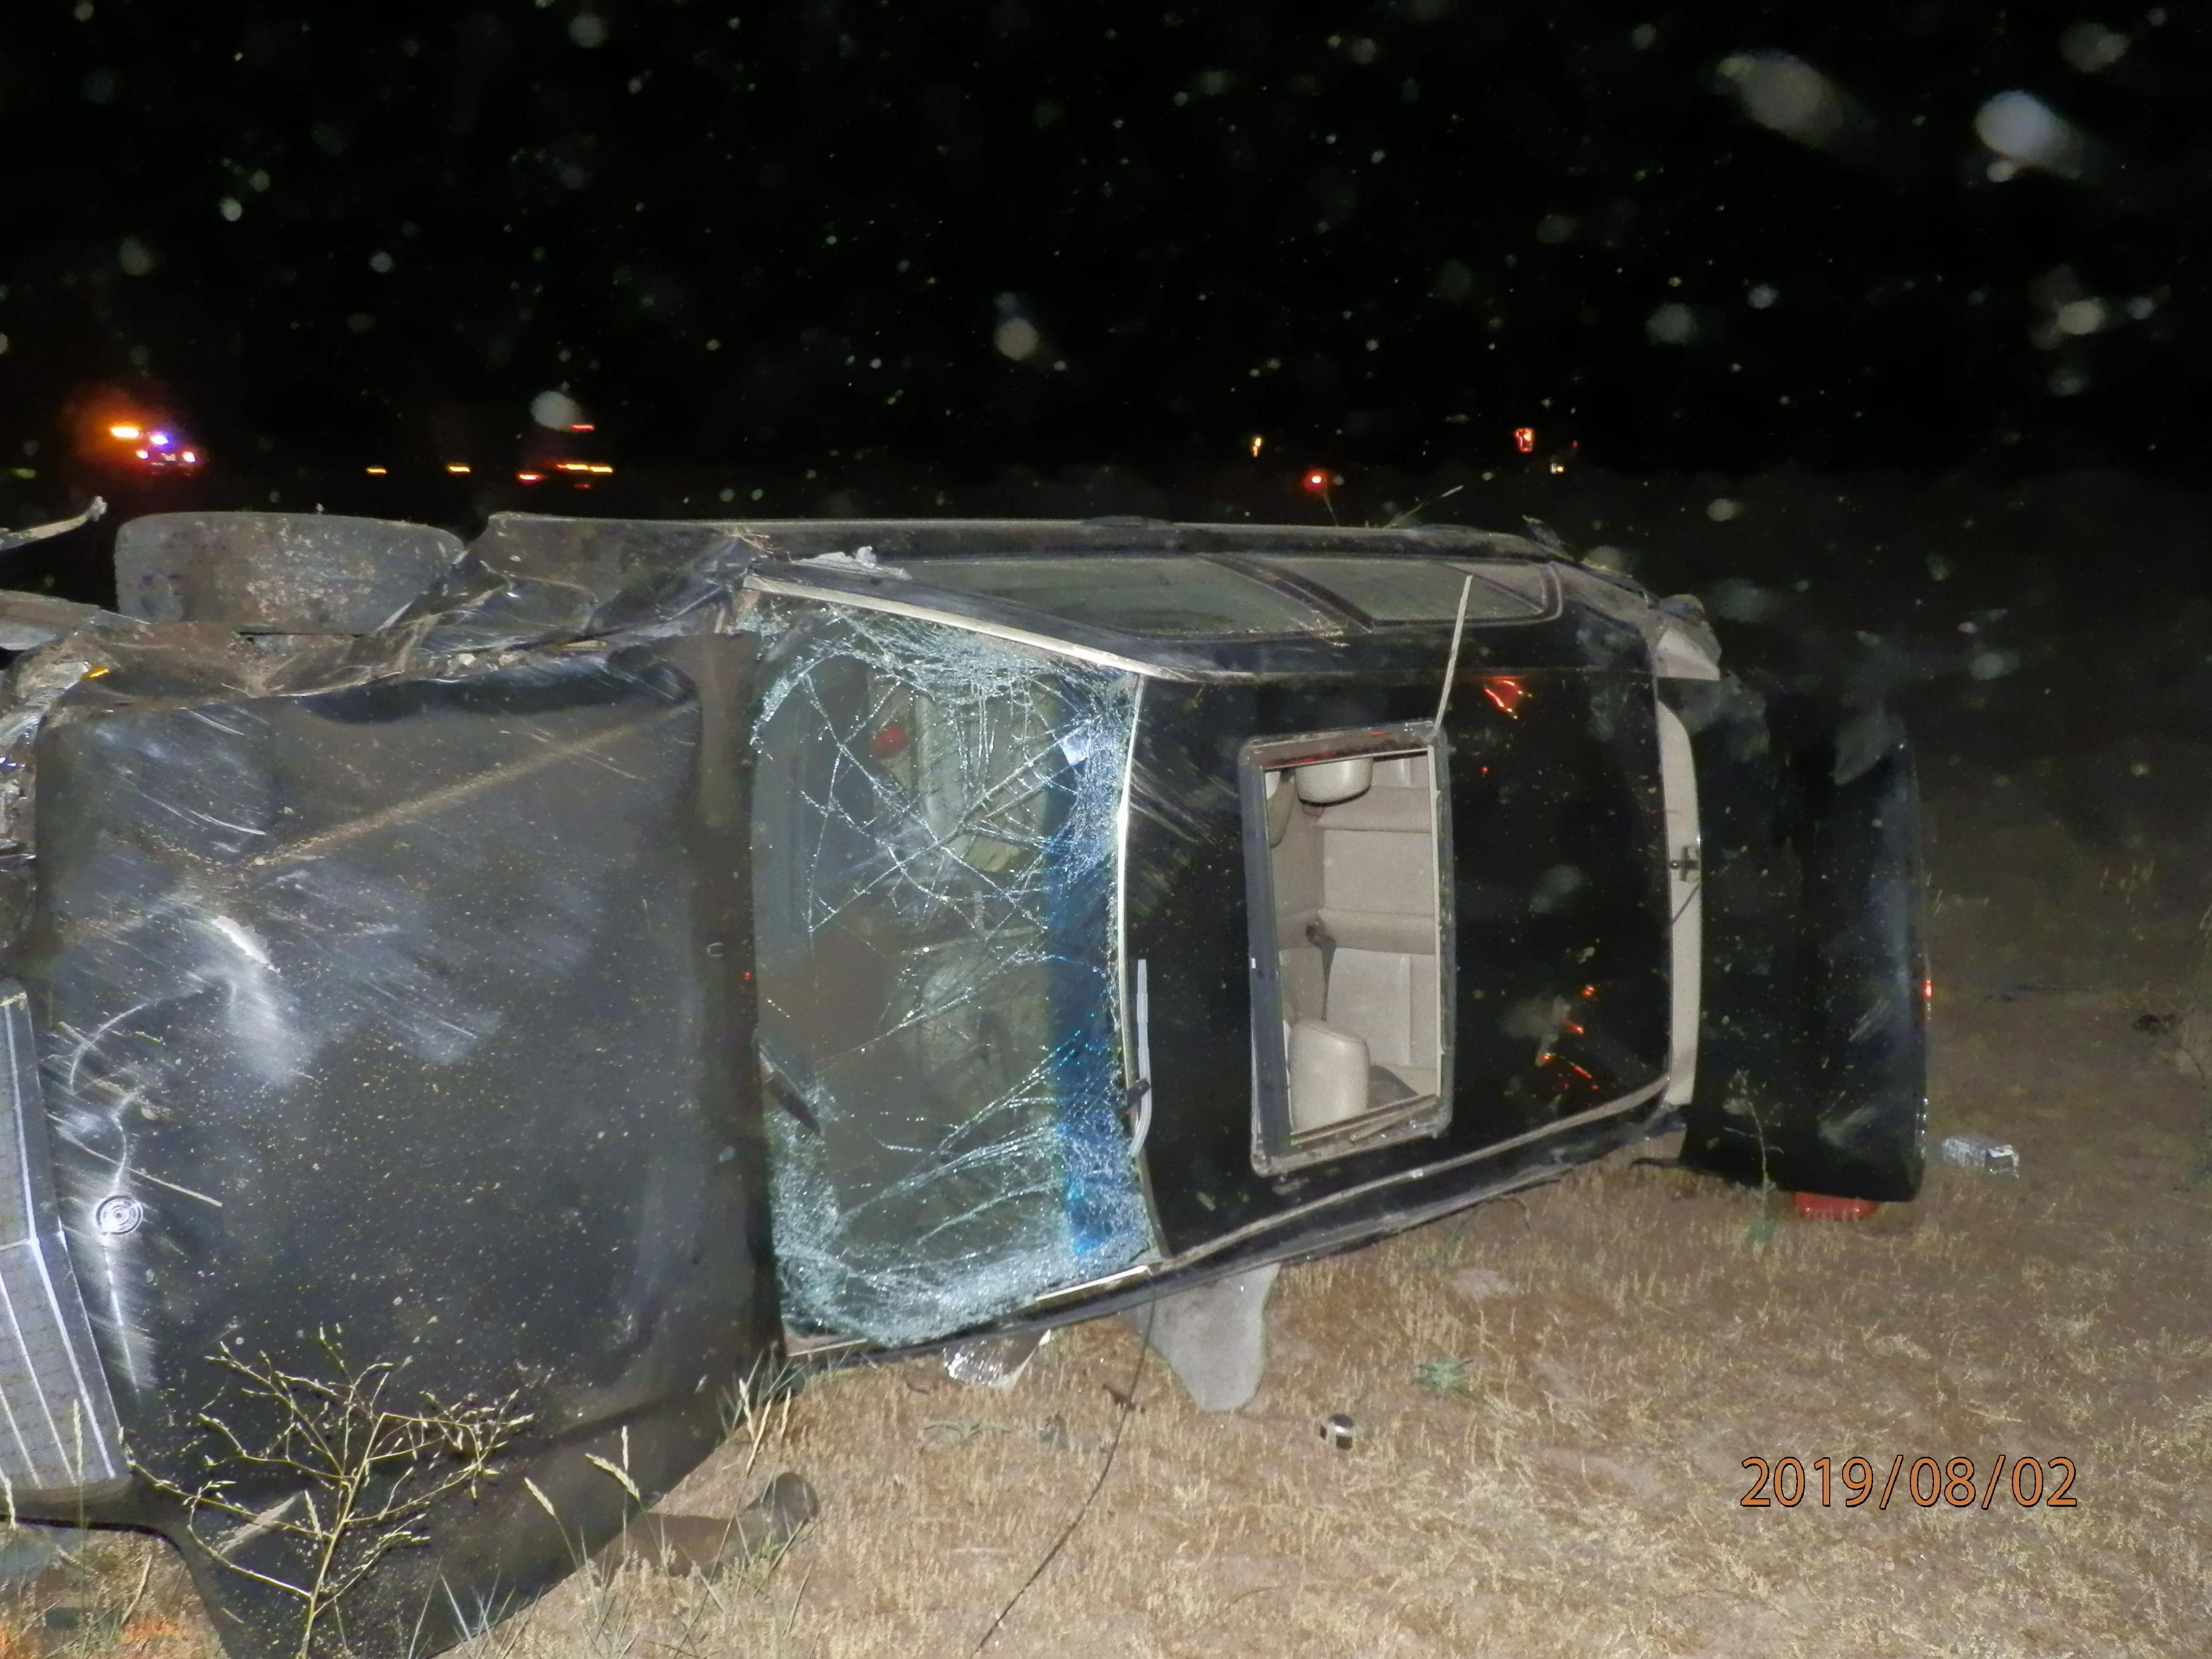 Additional details and photos – Fatal Crash MM 67 I-15 SB